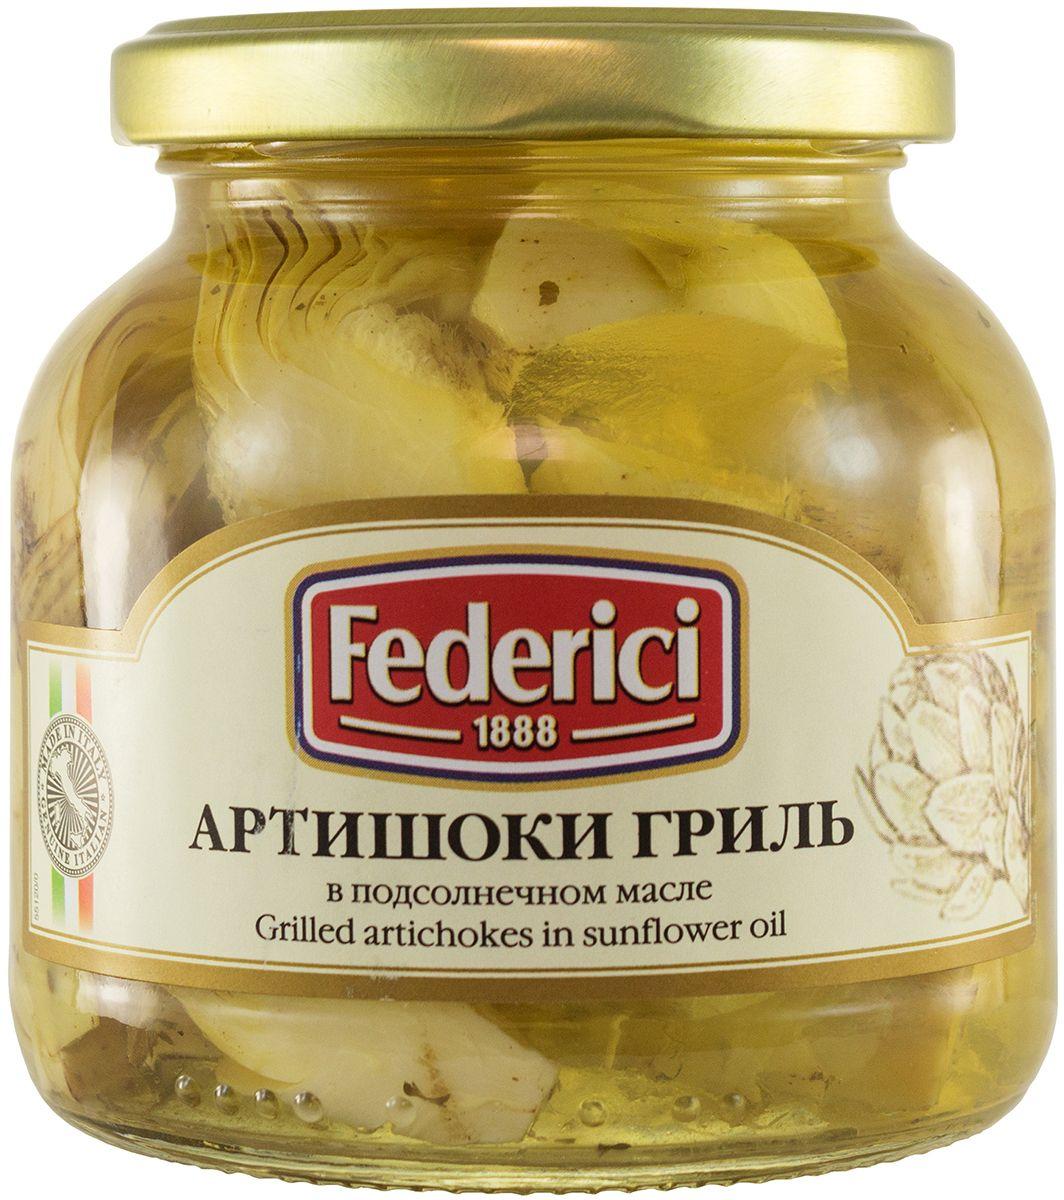 Federici Артишоки гриль в подсолнечном масле, 280 г federici spaghetti спагетти 500 г